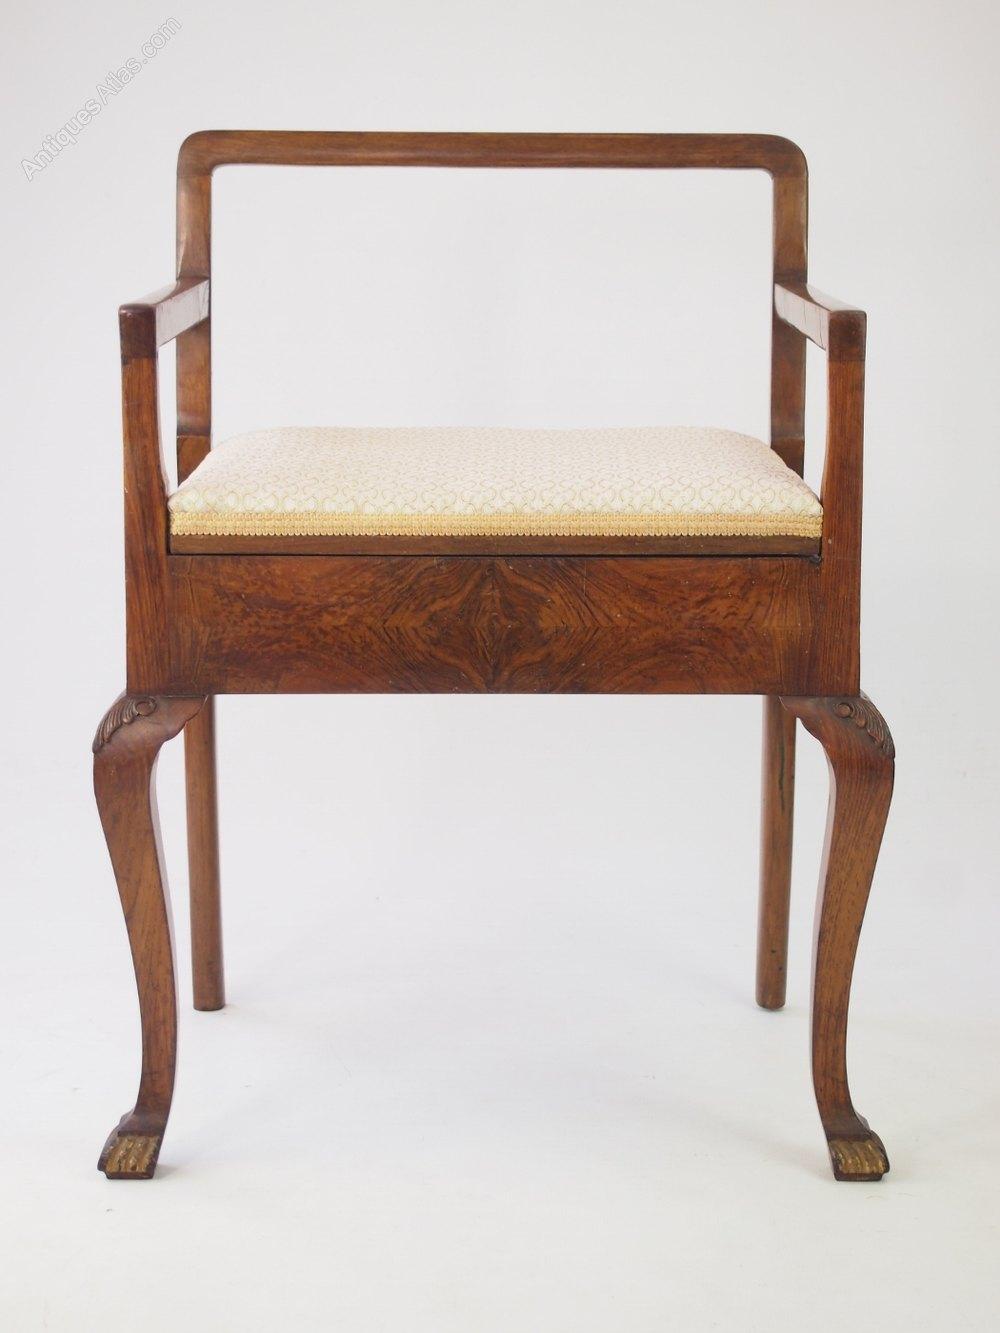 Art Deco Walnut Piano Stool Antique Piano Stools ... & Art Deco Walnut Piano Stool - Antiques Atlas islam-shia.org